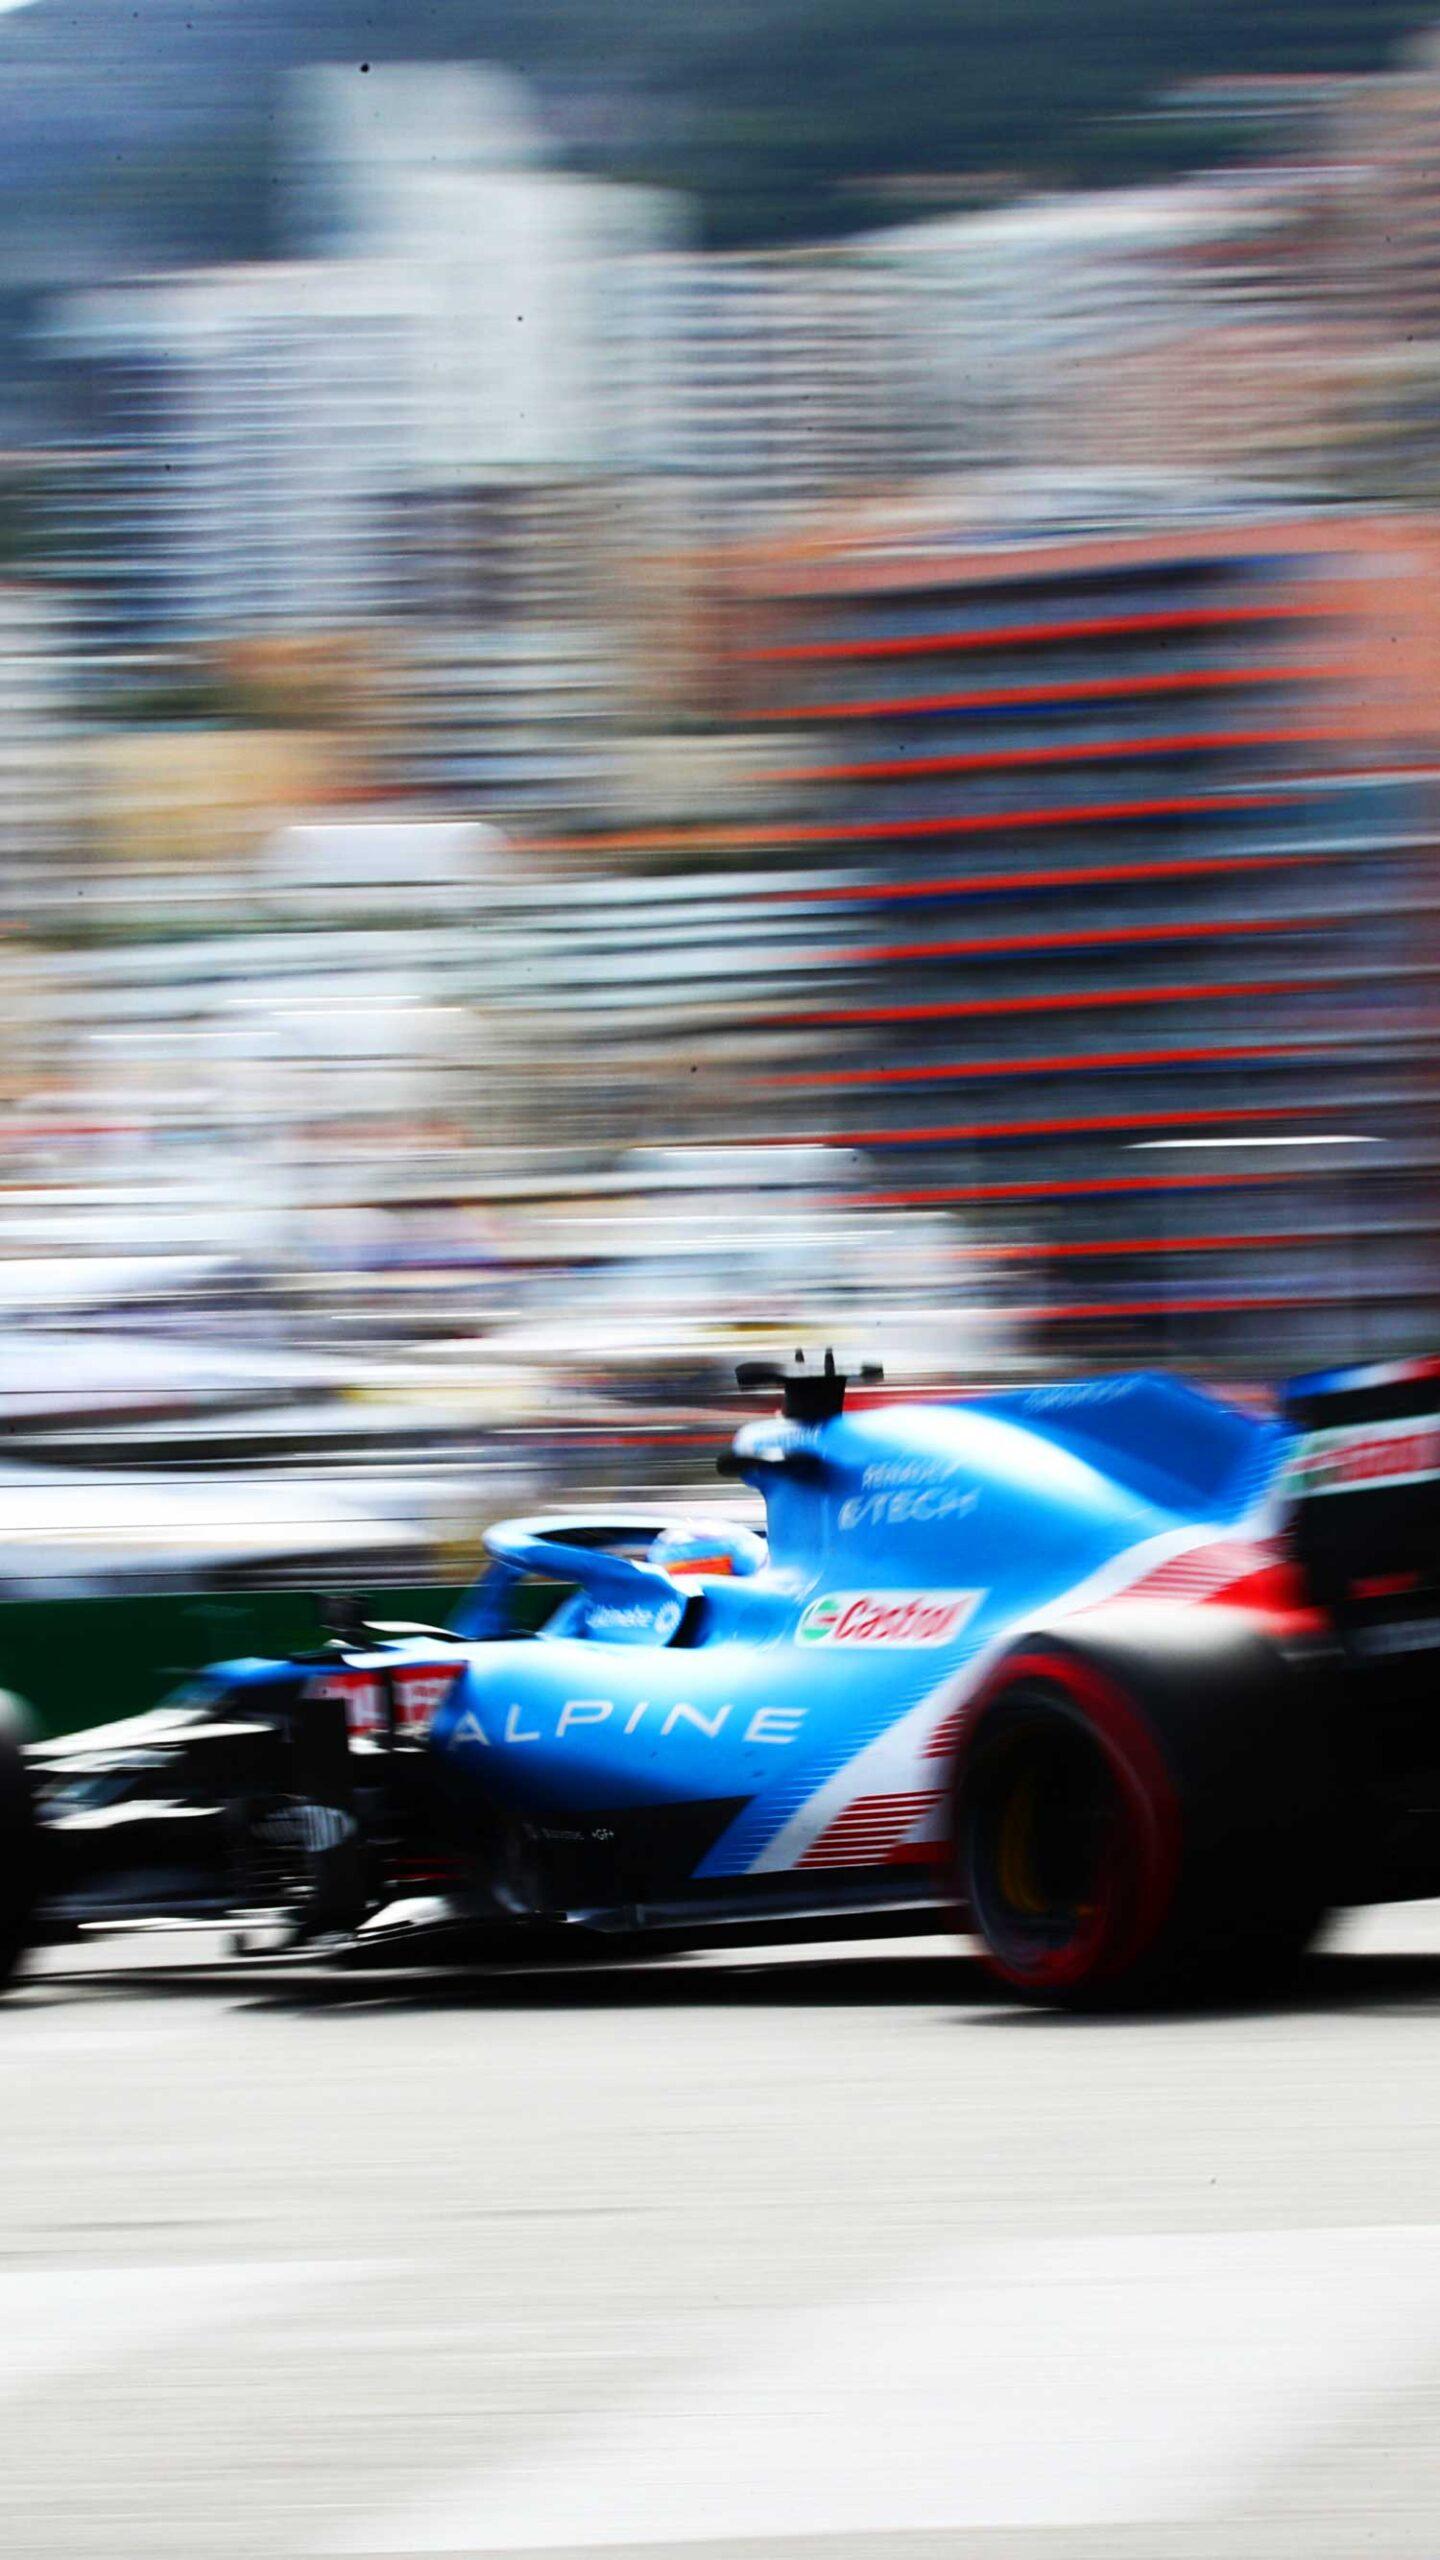 Alpine F1 Team em Mônaco